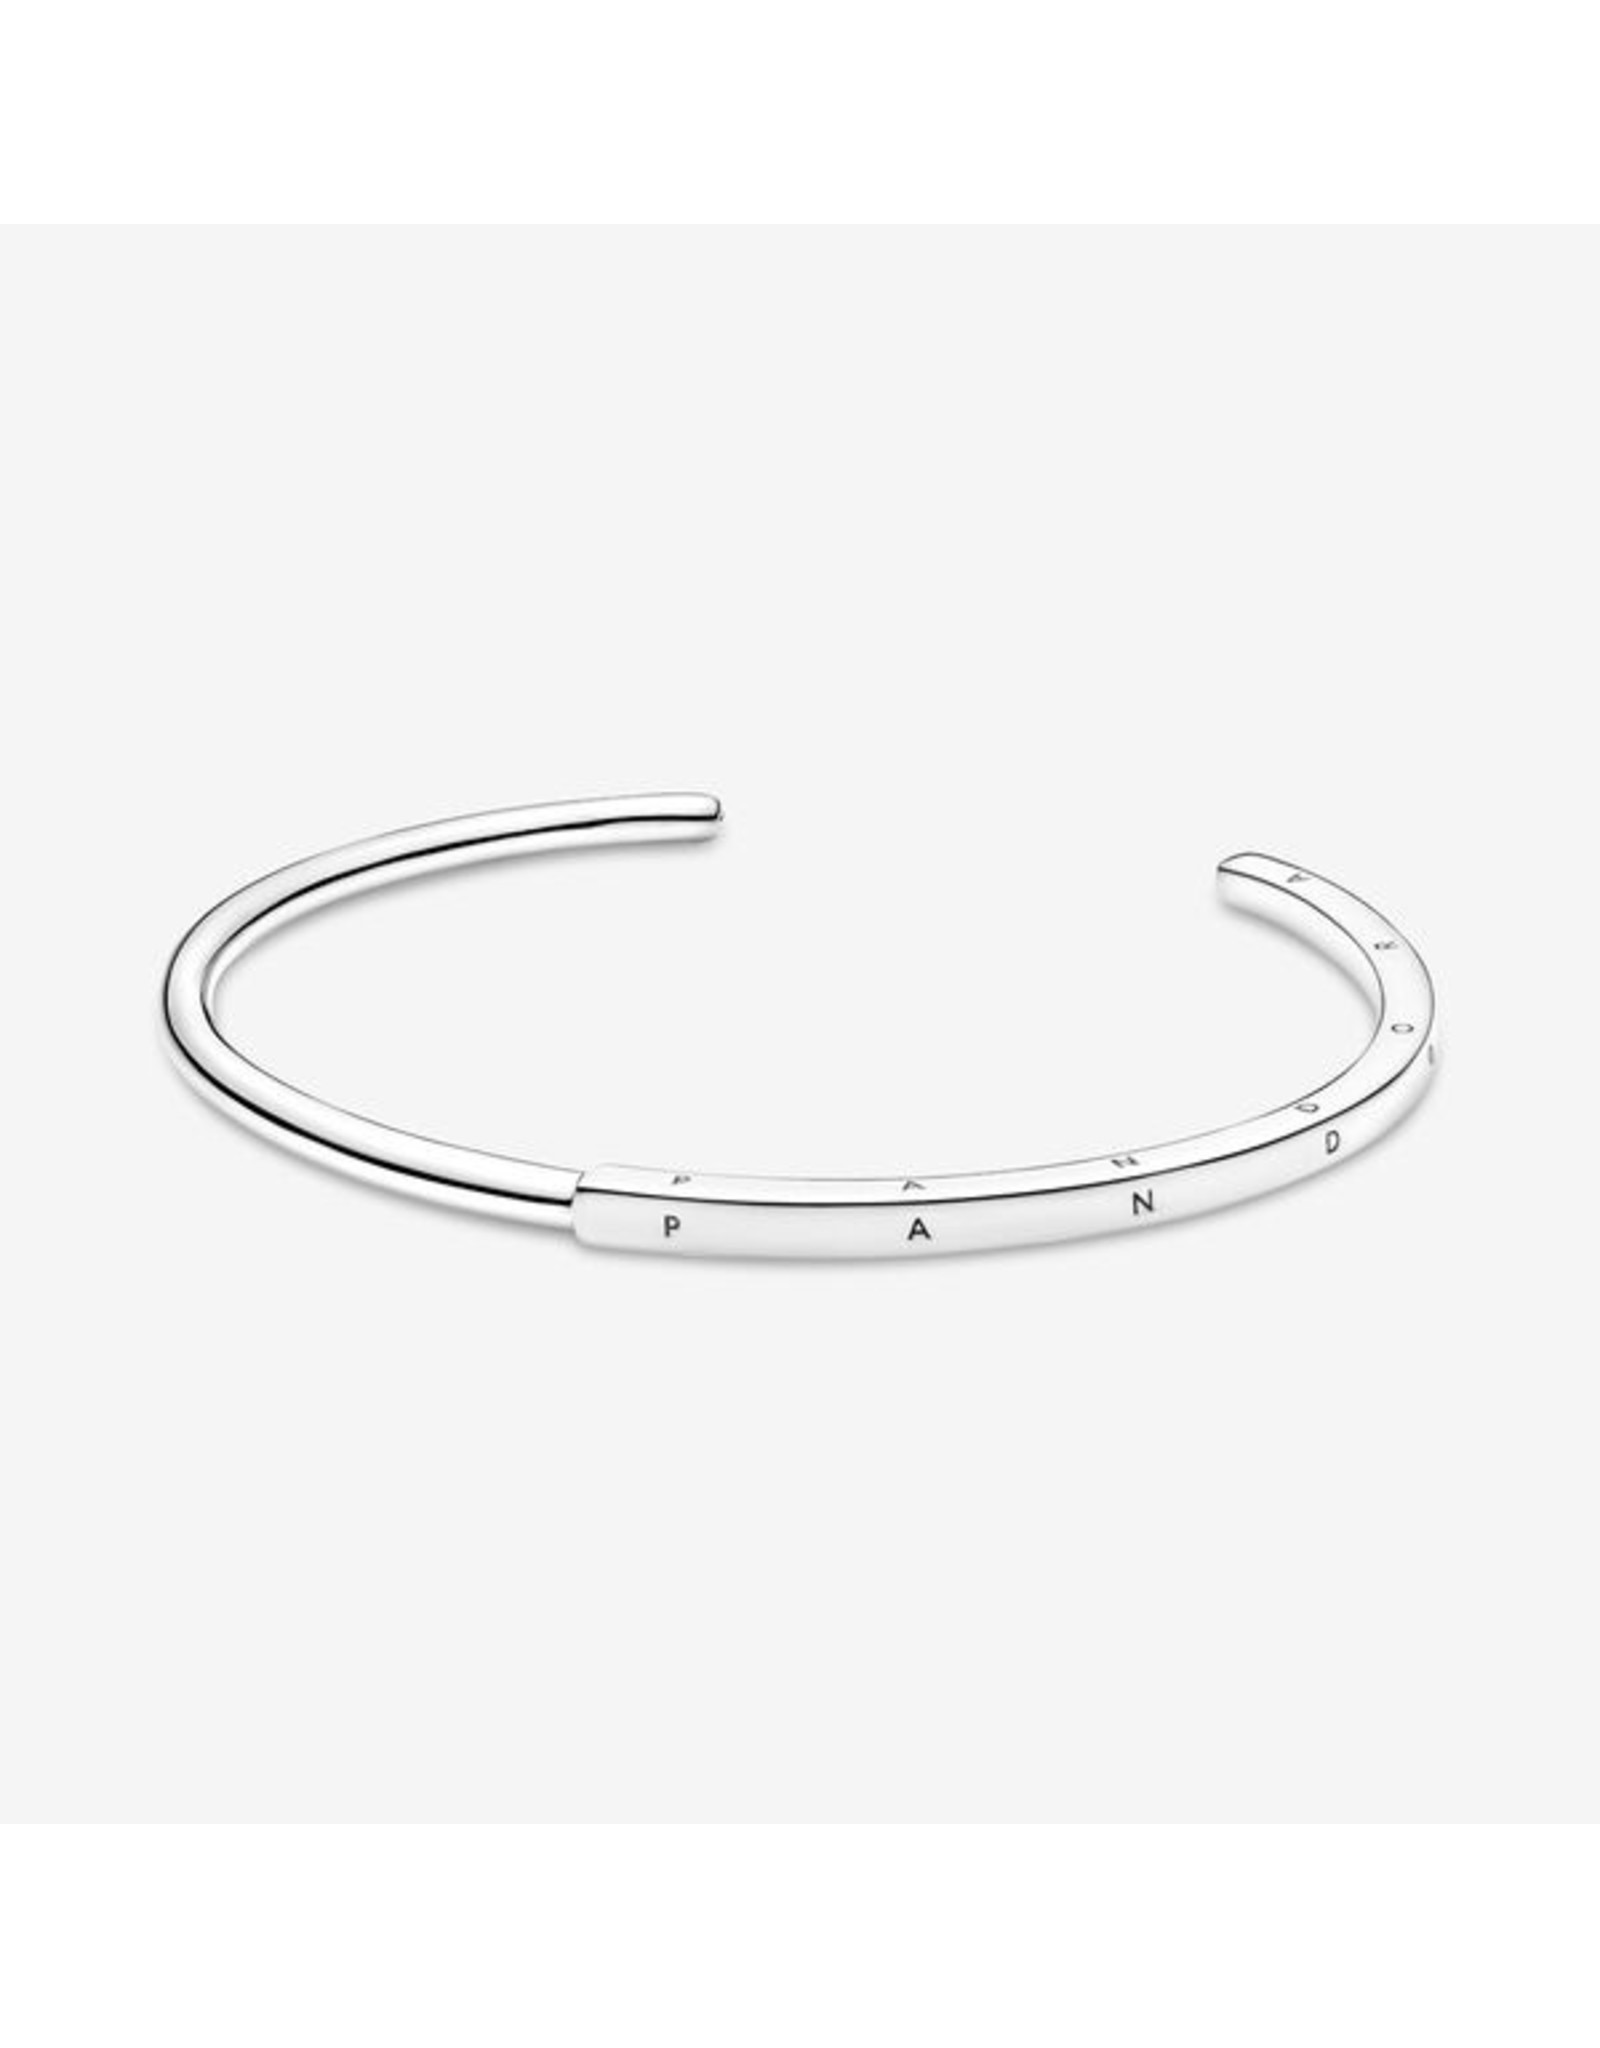 Pandora Pandora Bracelet,599493C00, Signature Open Bangle, Silver